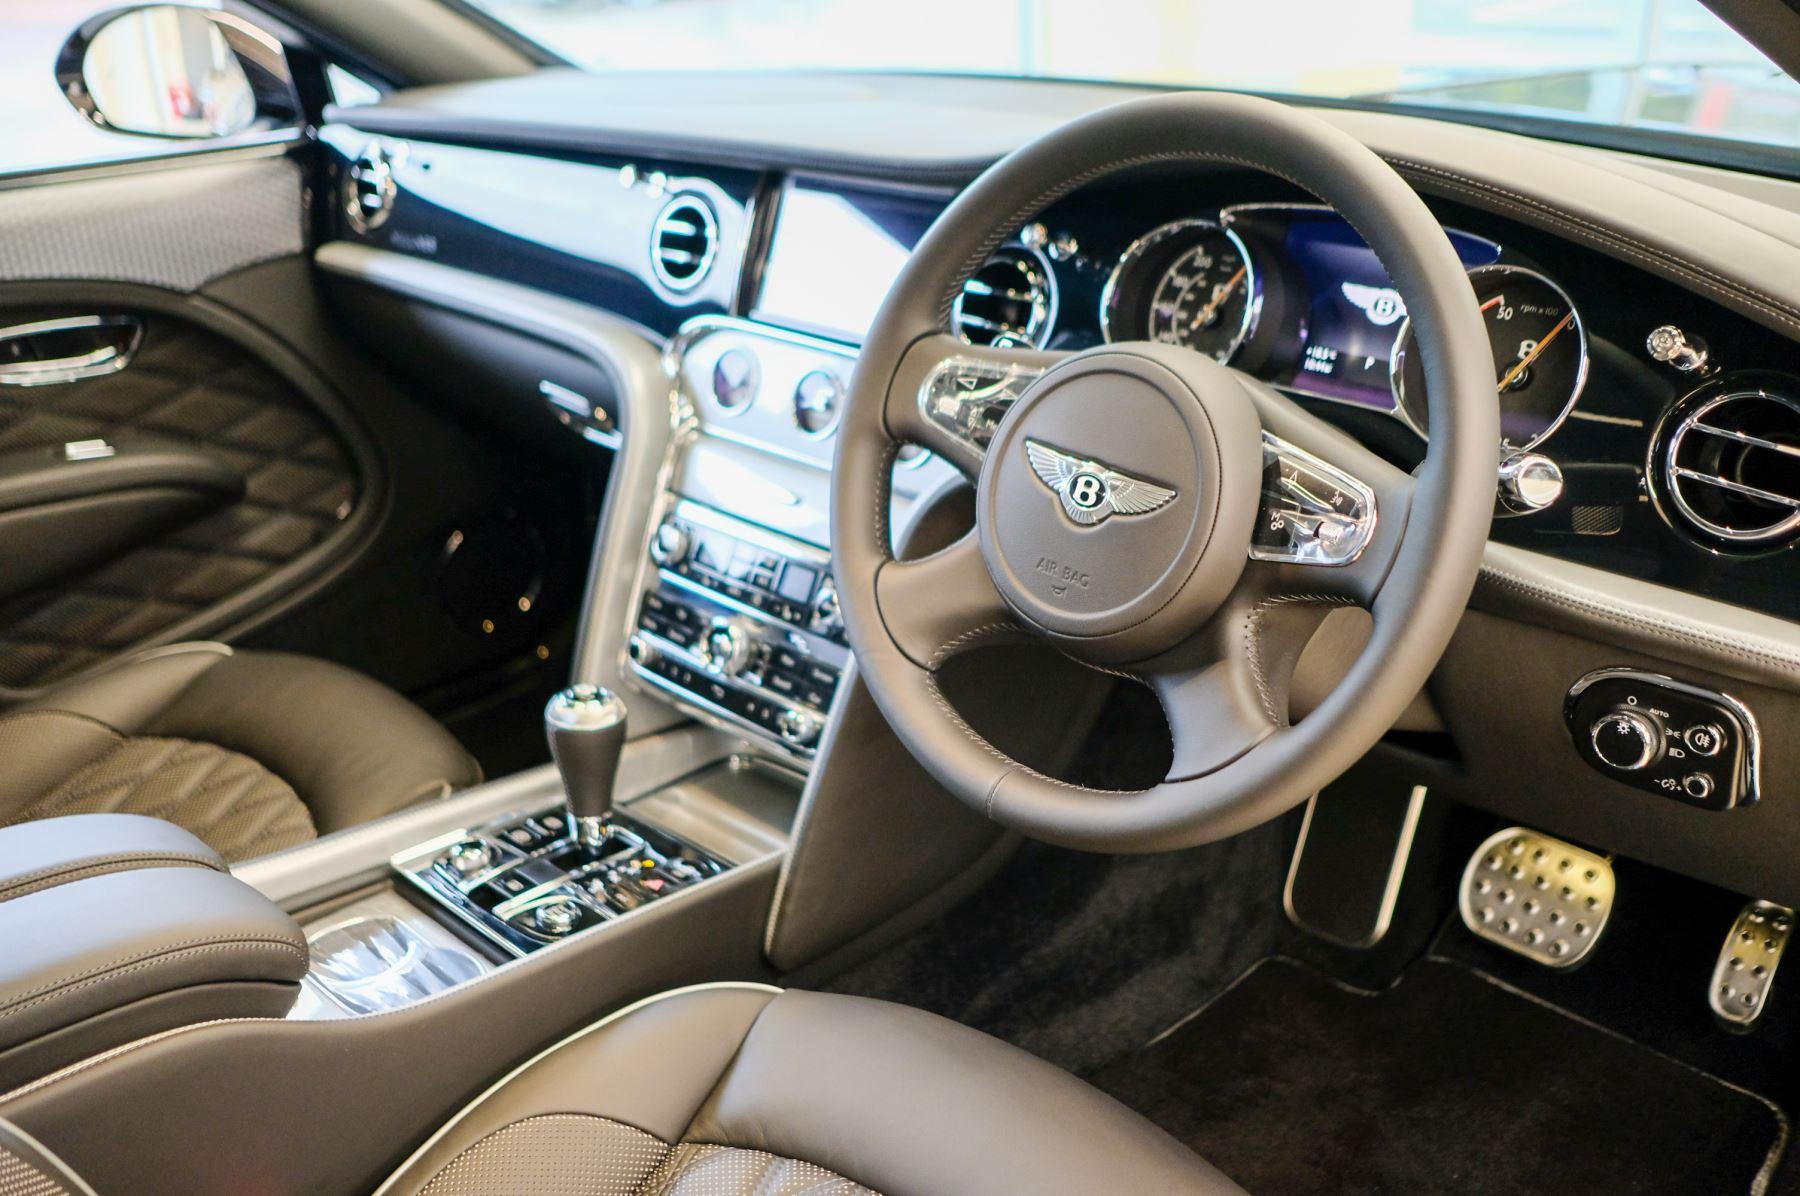 Bentley Mulsanne Mulsanne 6.75 Edition by Mulliner image 12